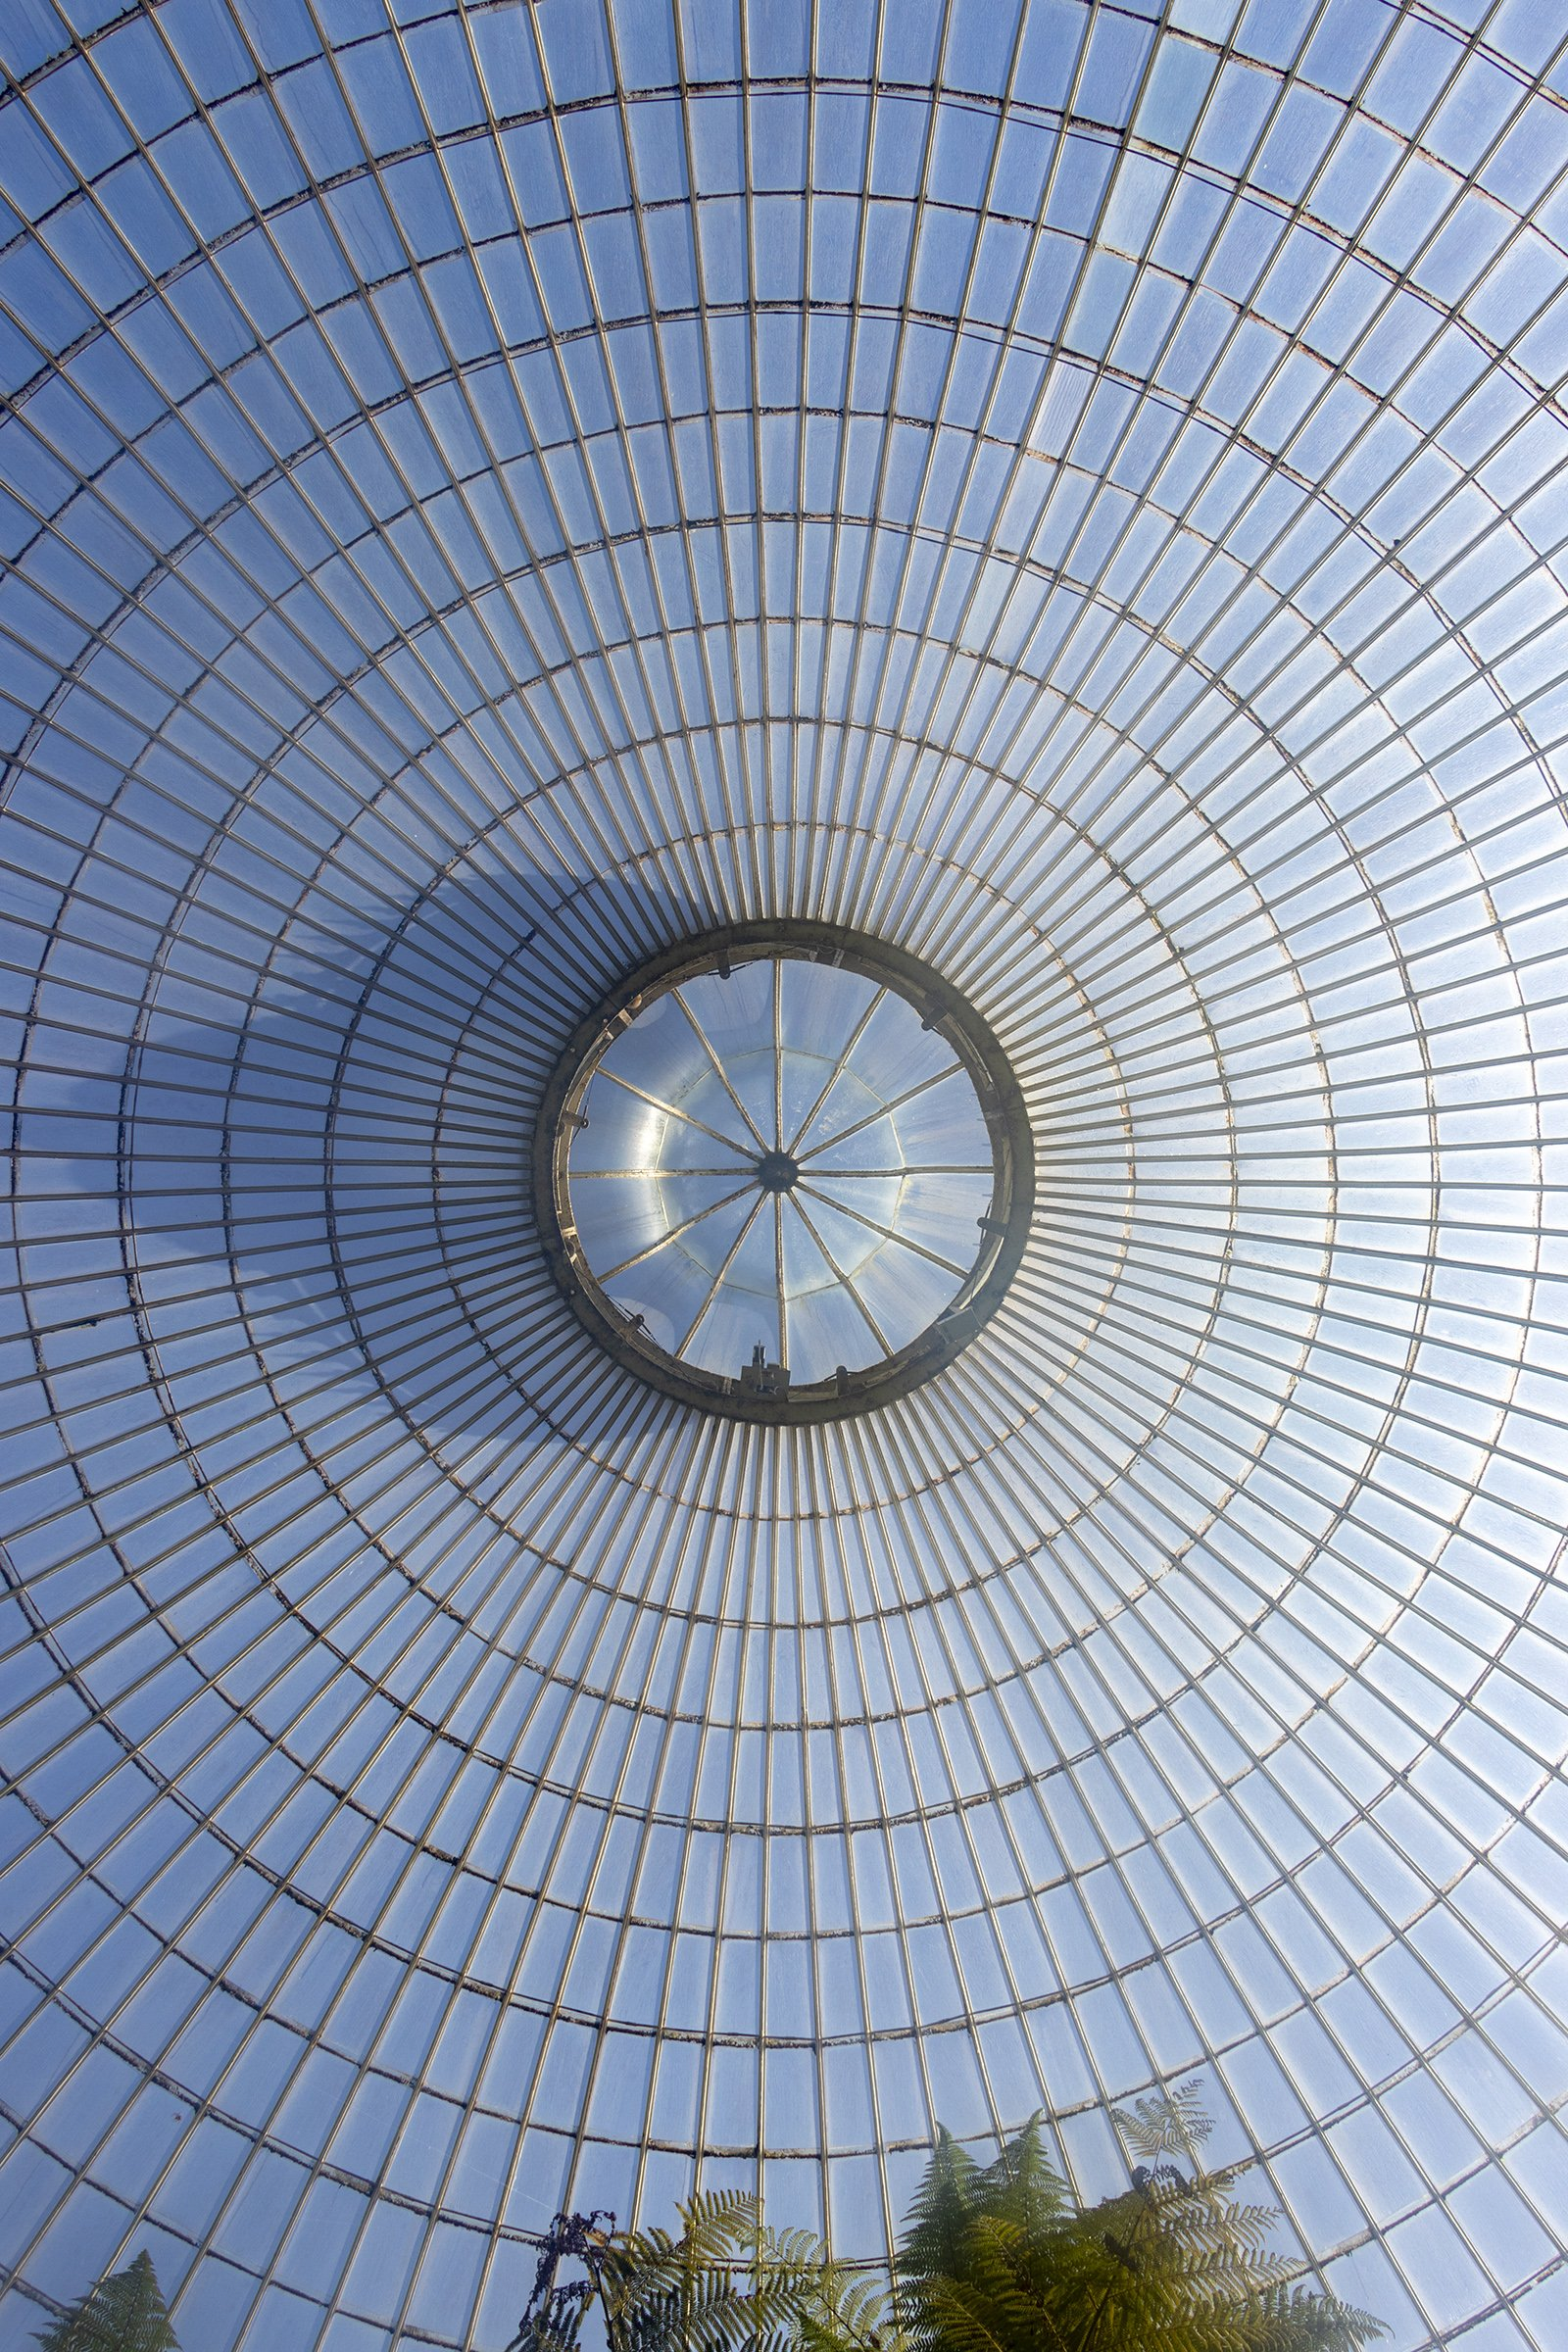 Kibble Palace, Glasgow Botanic Gardens ceiling